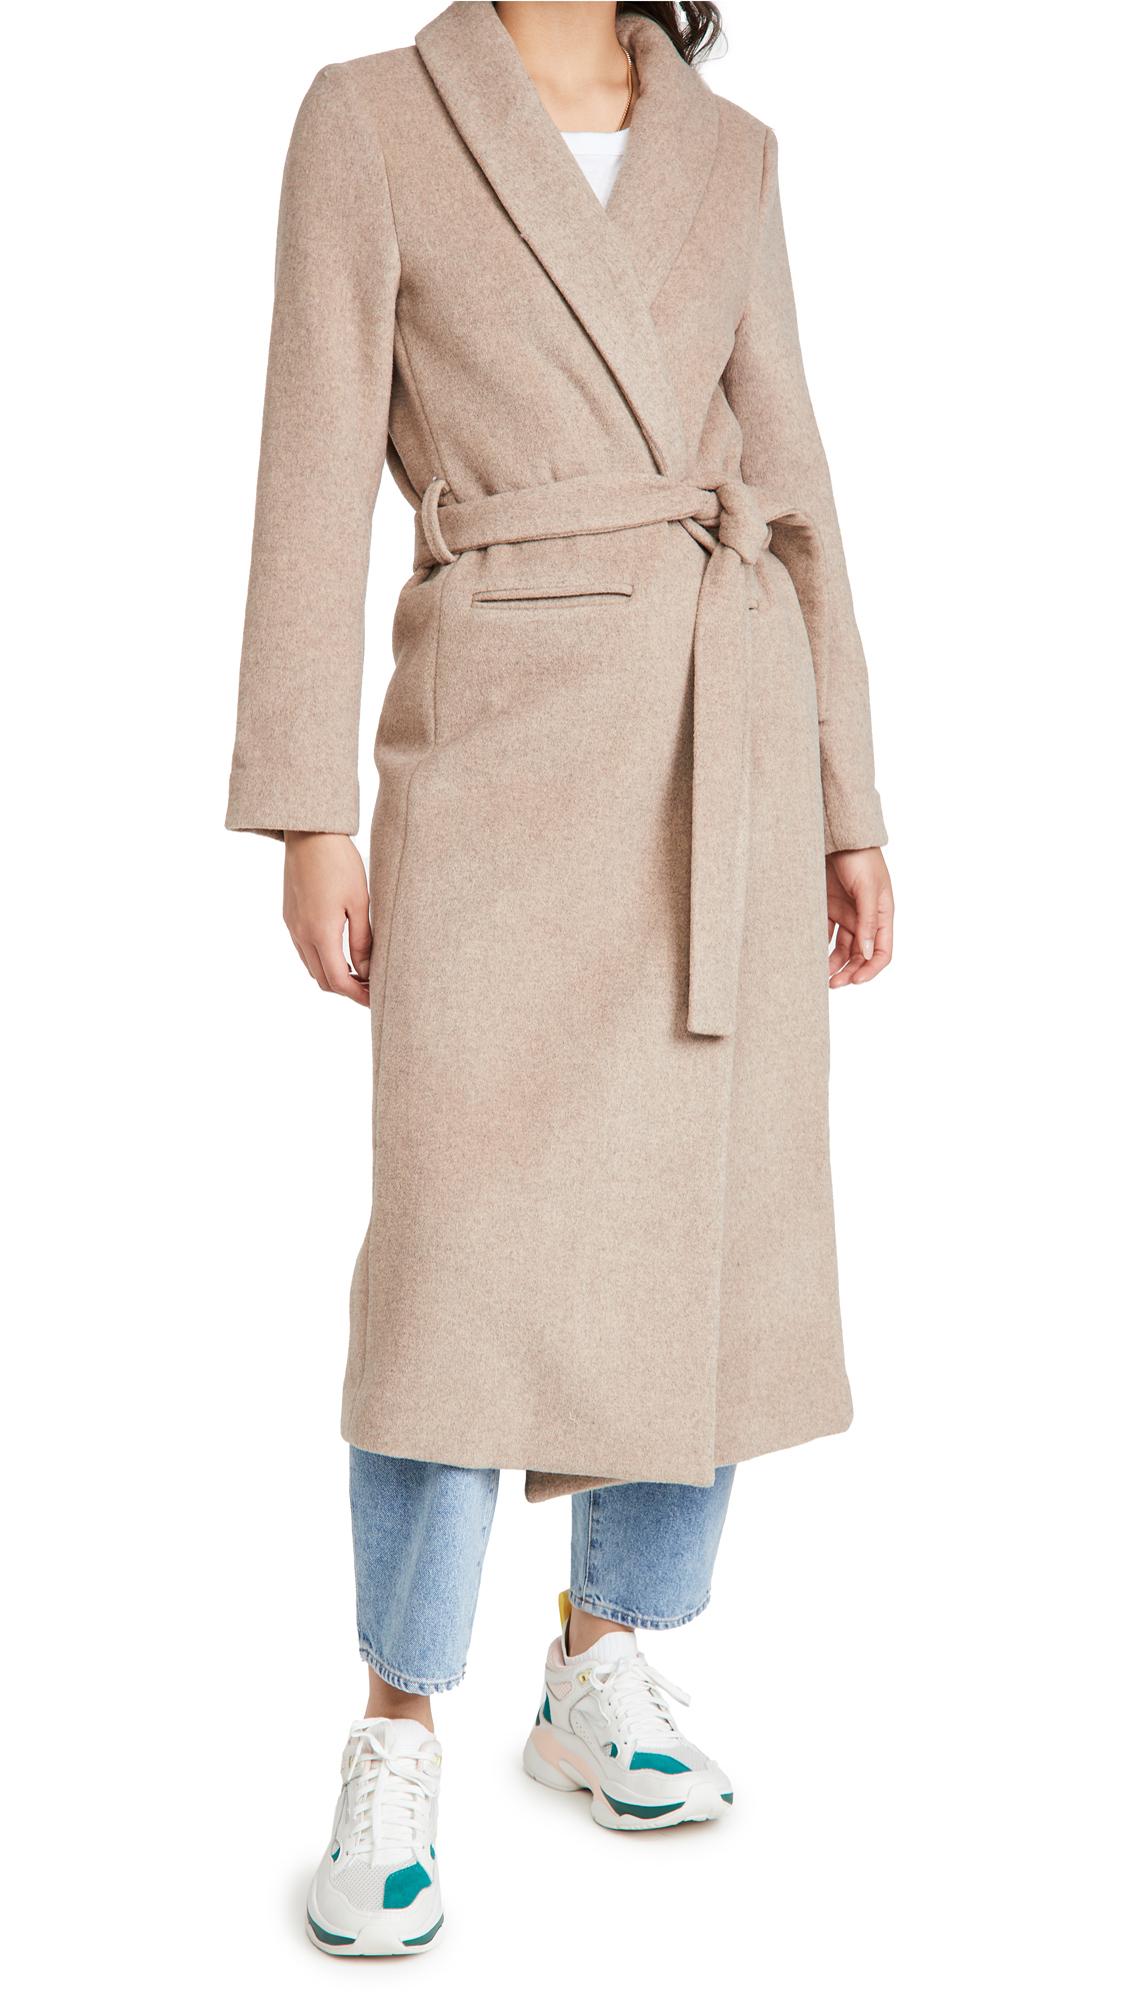 Reformation Greenwich Coat